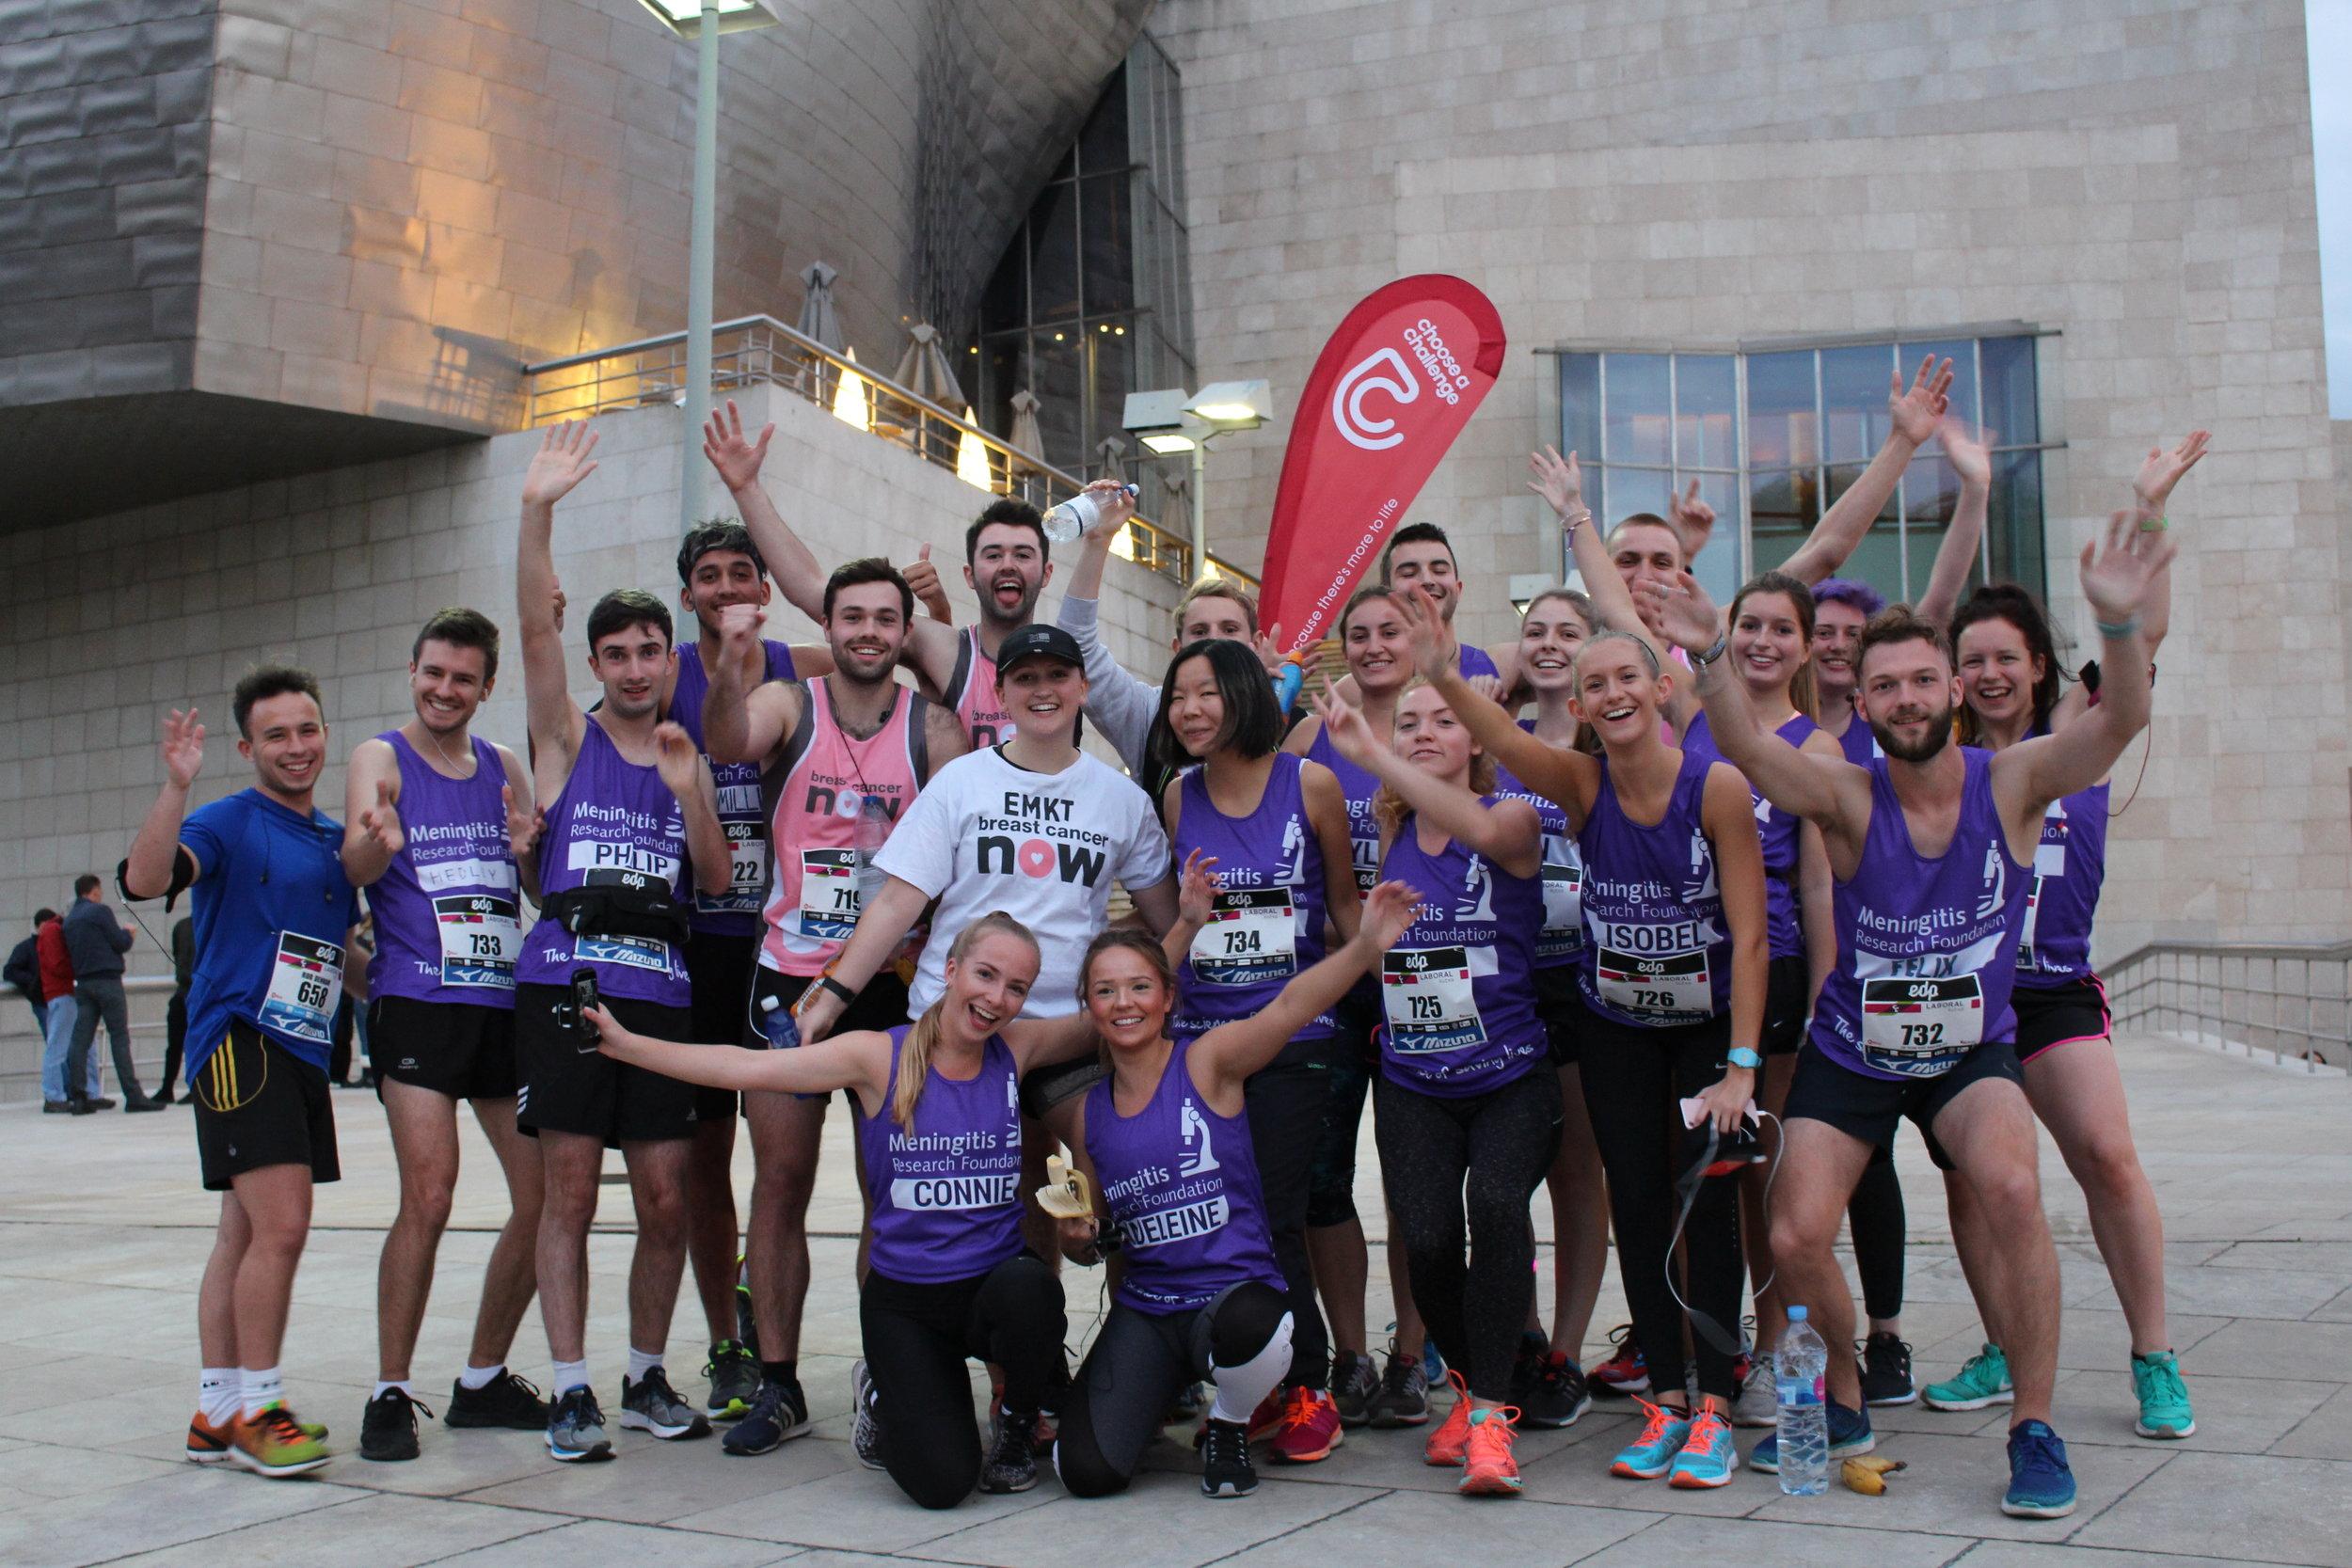 The 2017 Bilbao Night Marathon team